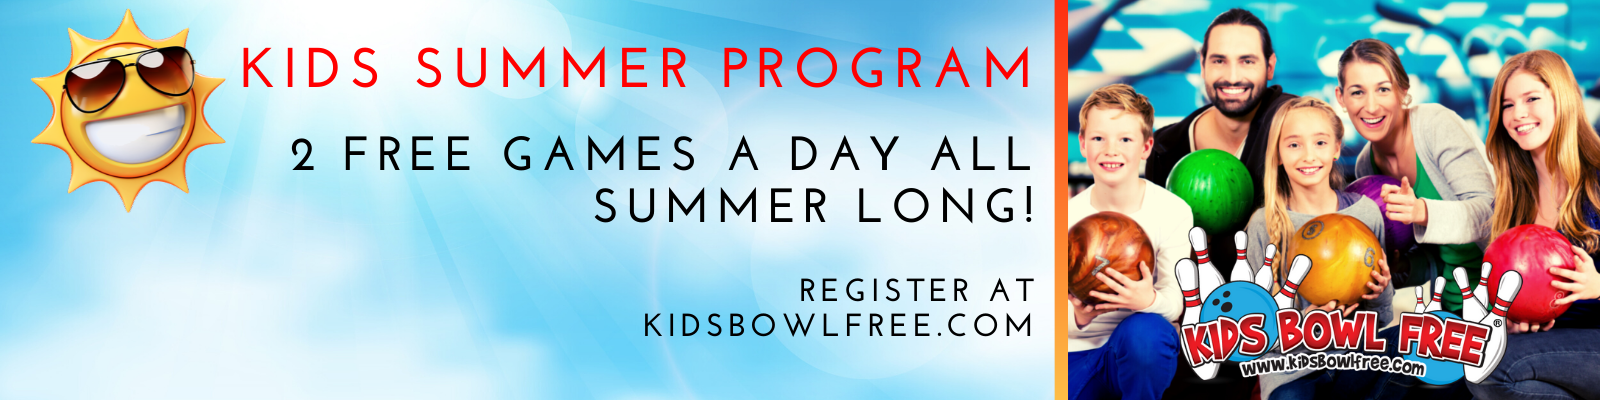 Kids Bowl Free National Program | Odyssey Fun Center Participant